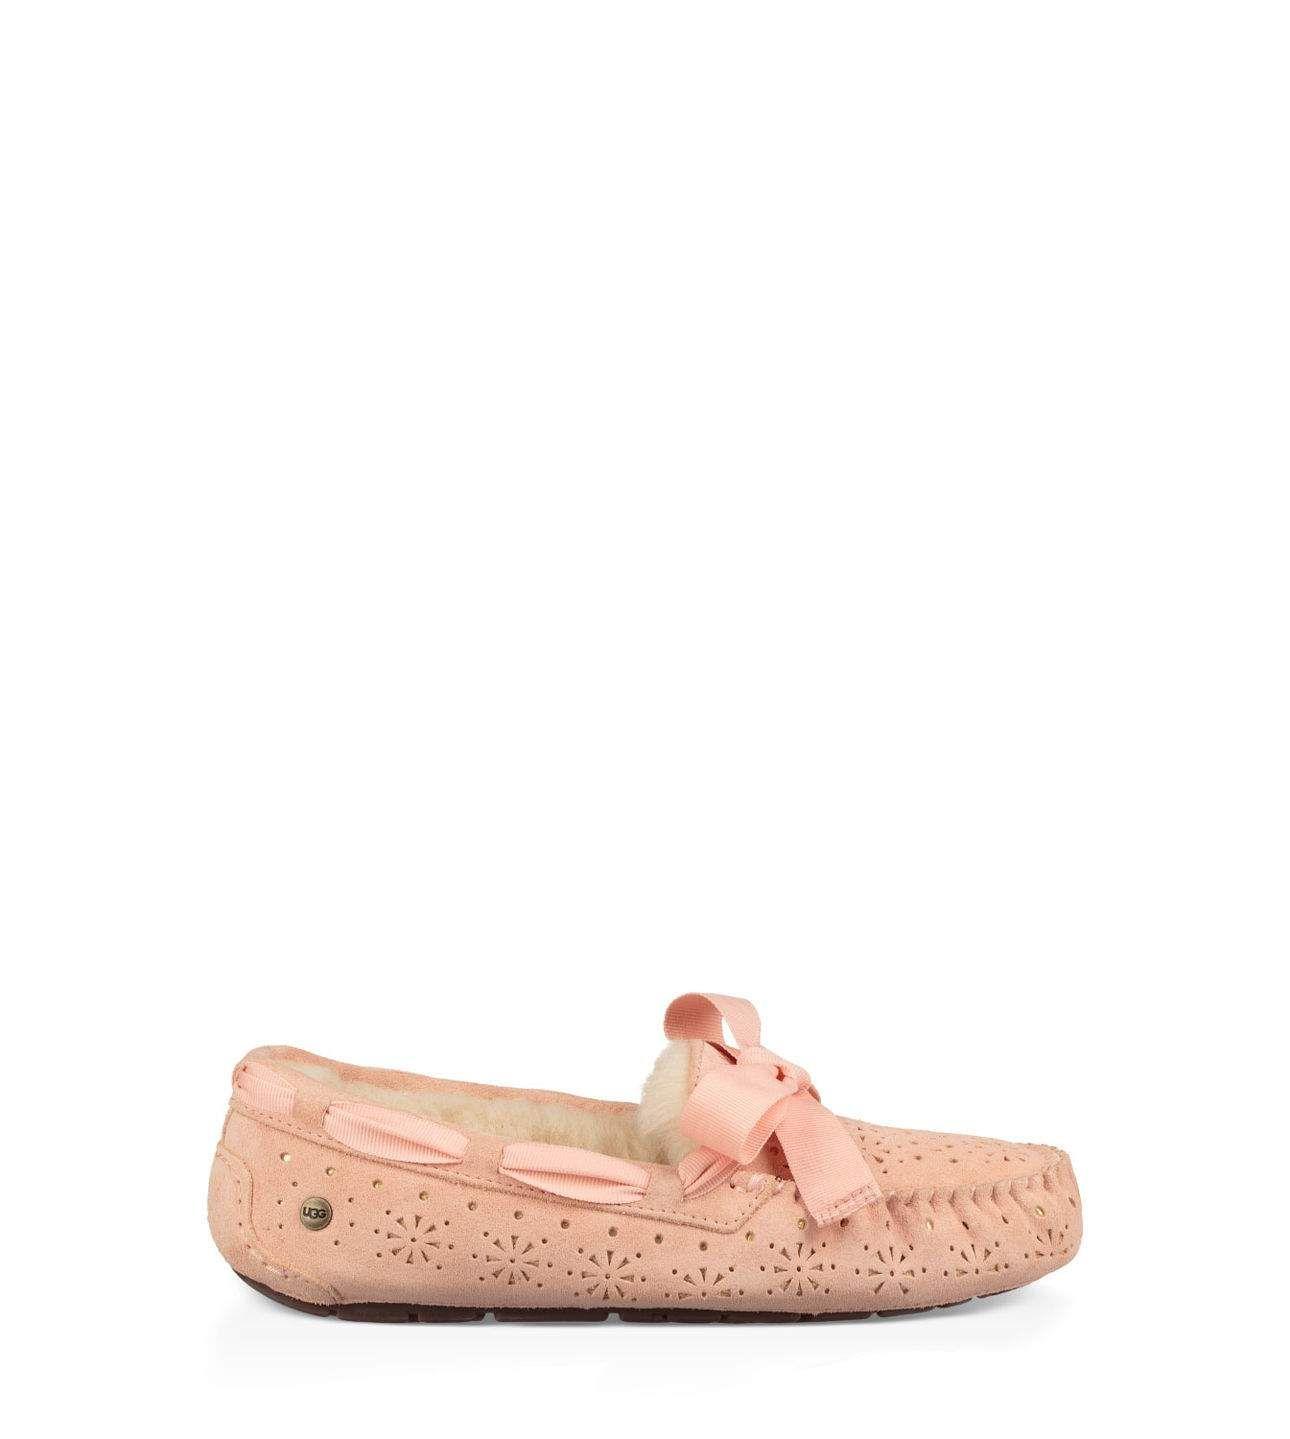 5fc21f3e915 Women's Share this product Dakota Sunshine Perf | Women's Footwear ...